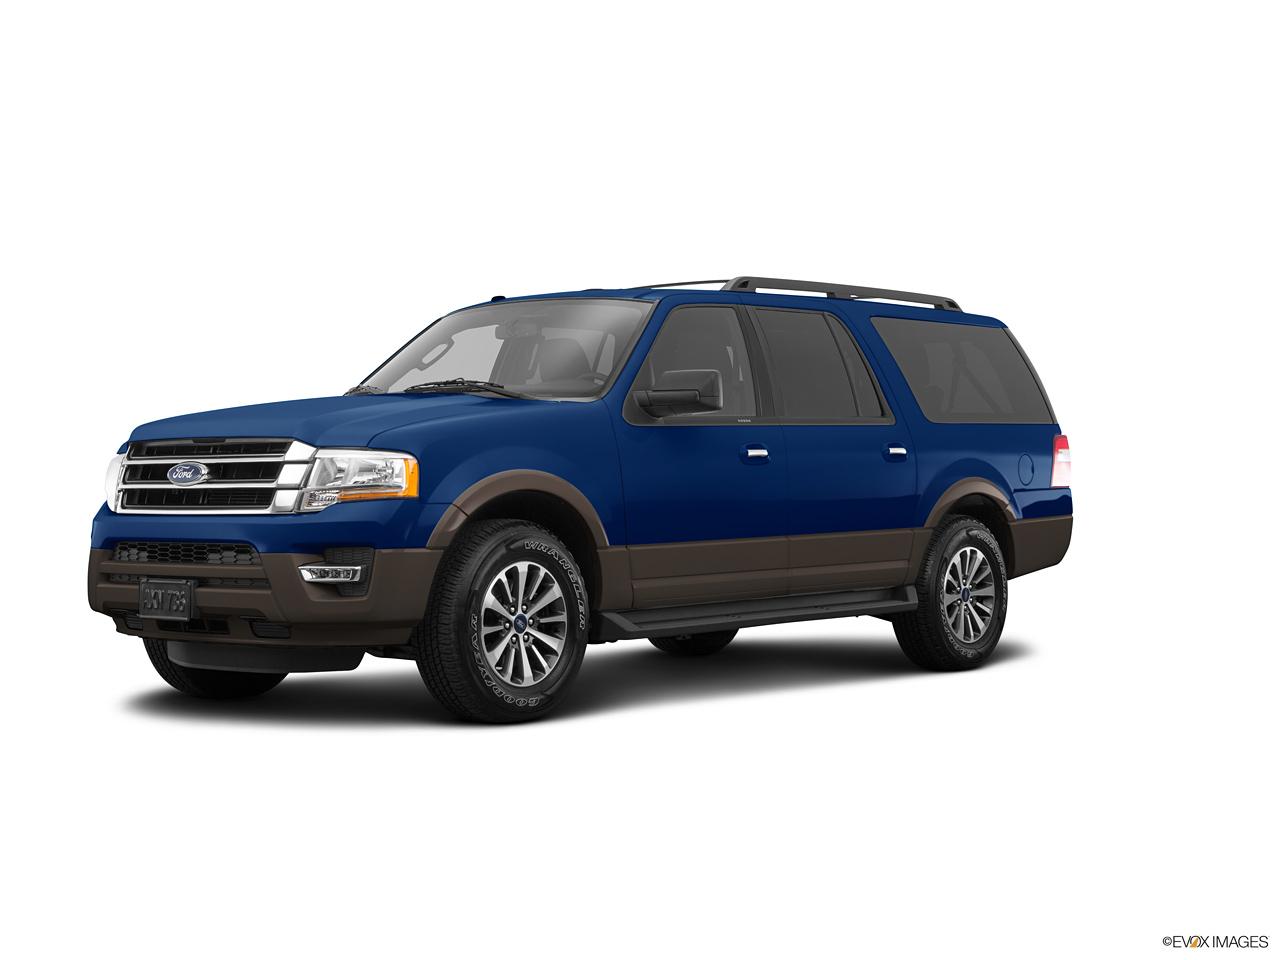 car pictures list for ford expedition el 2018 3 5l ecoboost xl bahrain yallamotor. Black Bedroom Furniture Sets. Home Design Ideas